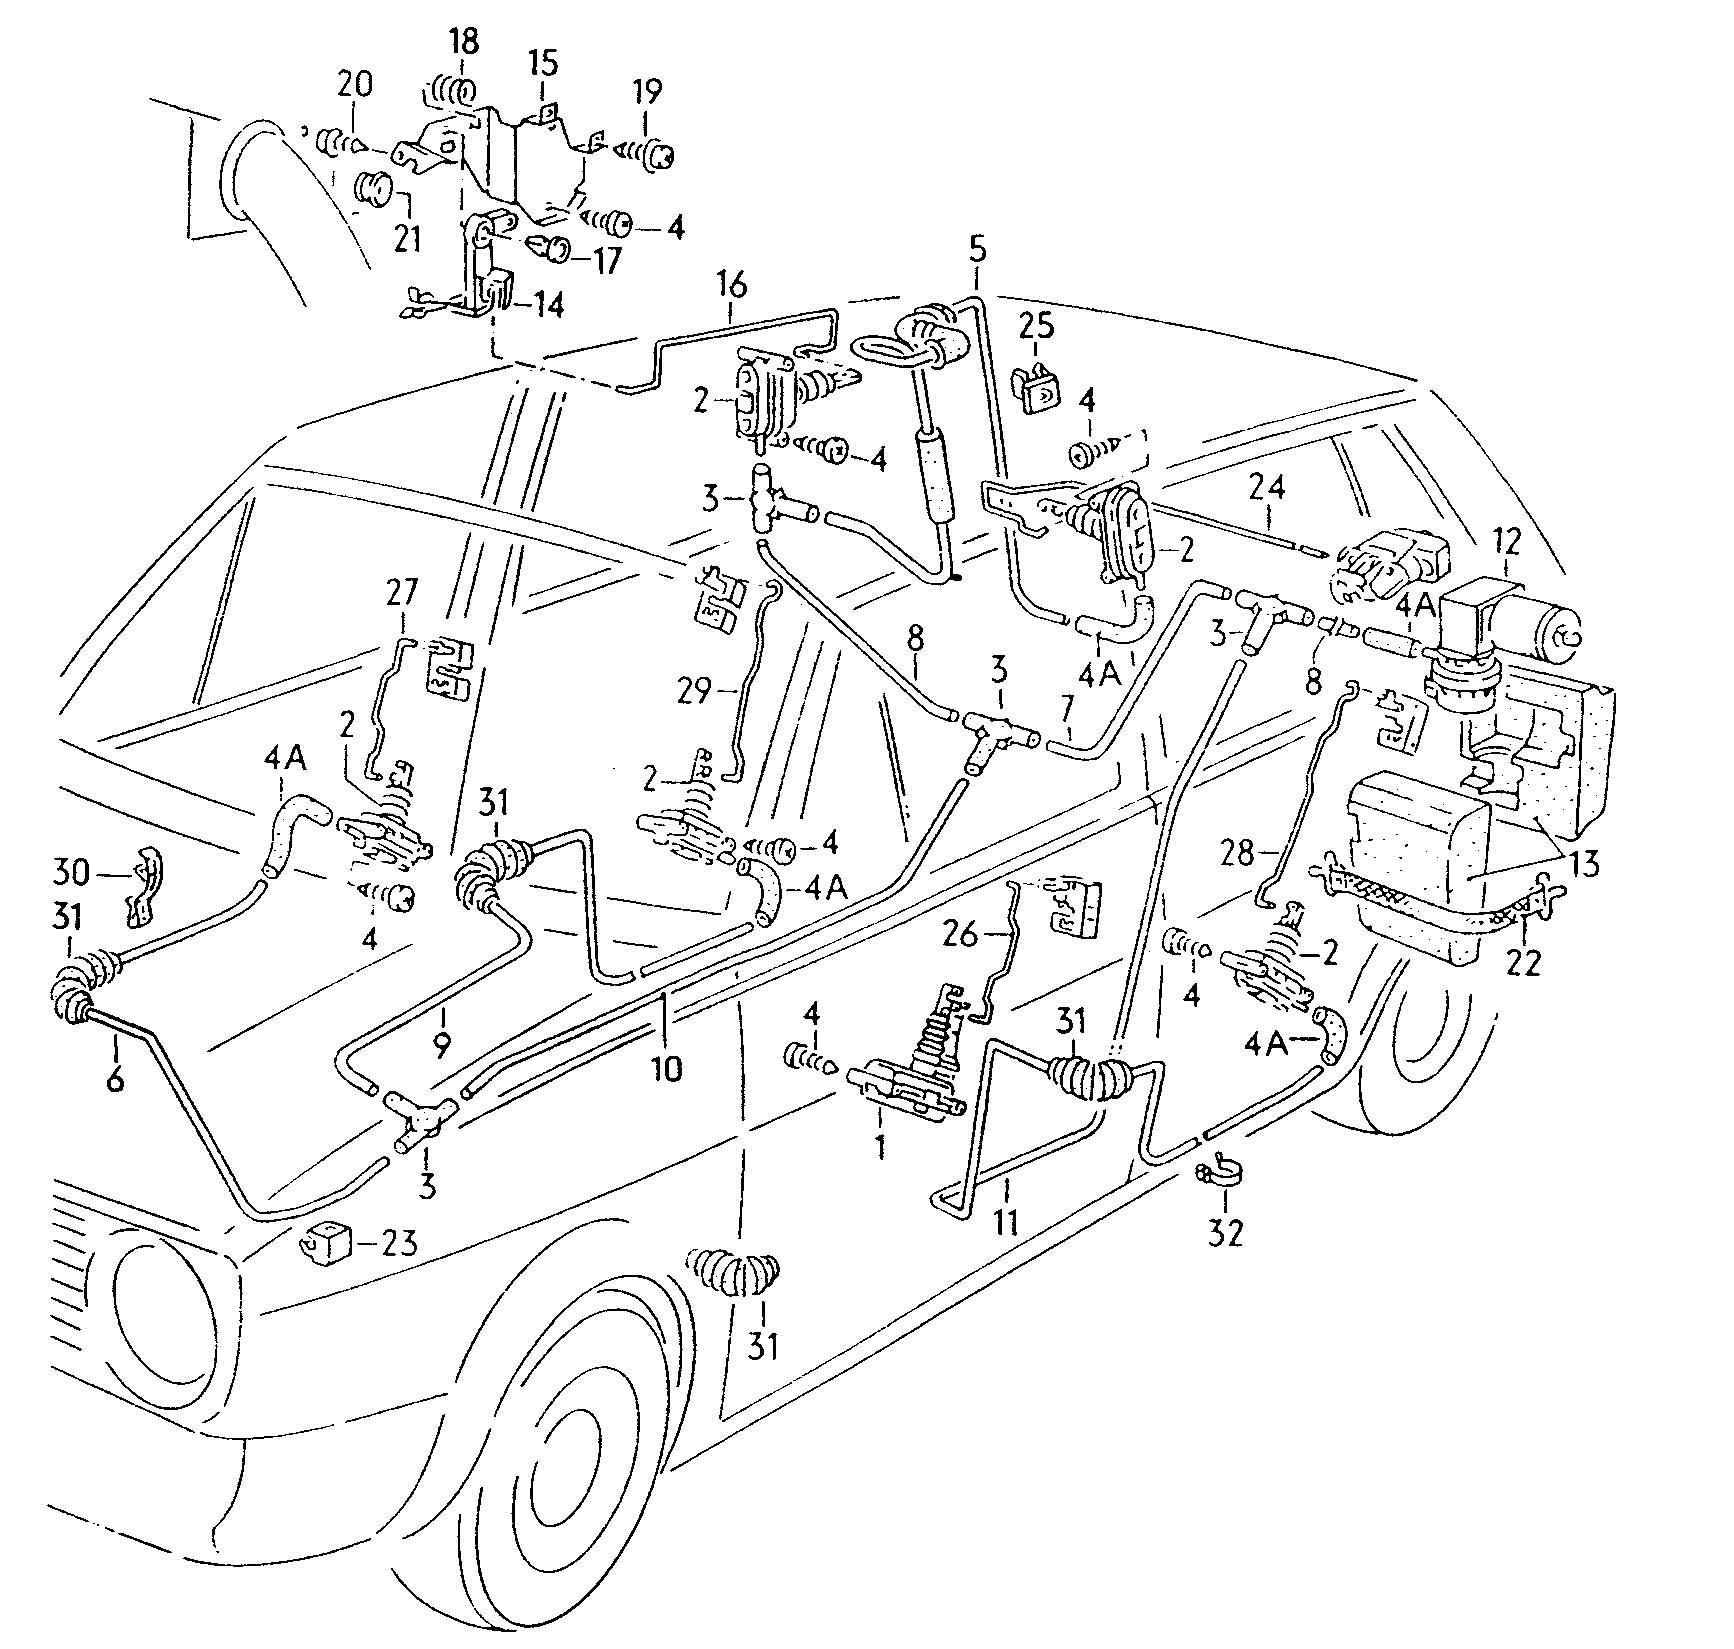 1986 Volkswagen Golf Central locking system